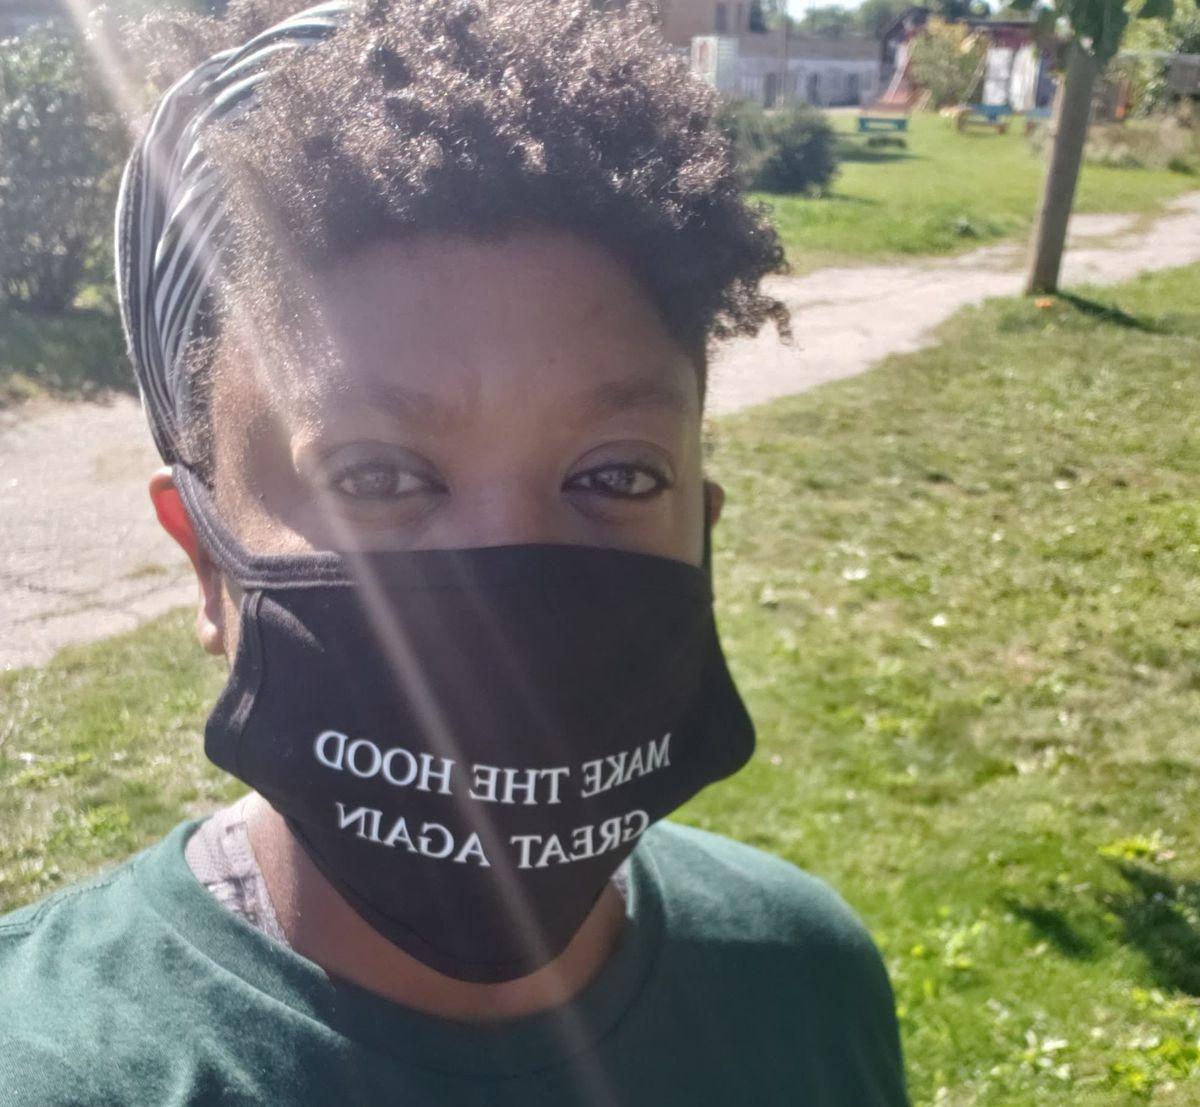 Ederique Goudia wears her Make the Hood Great Again mask.